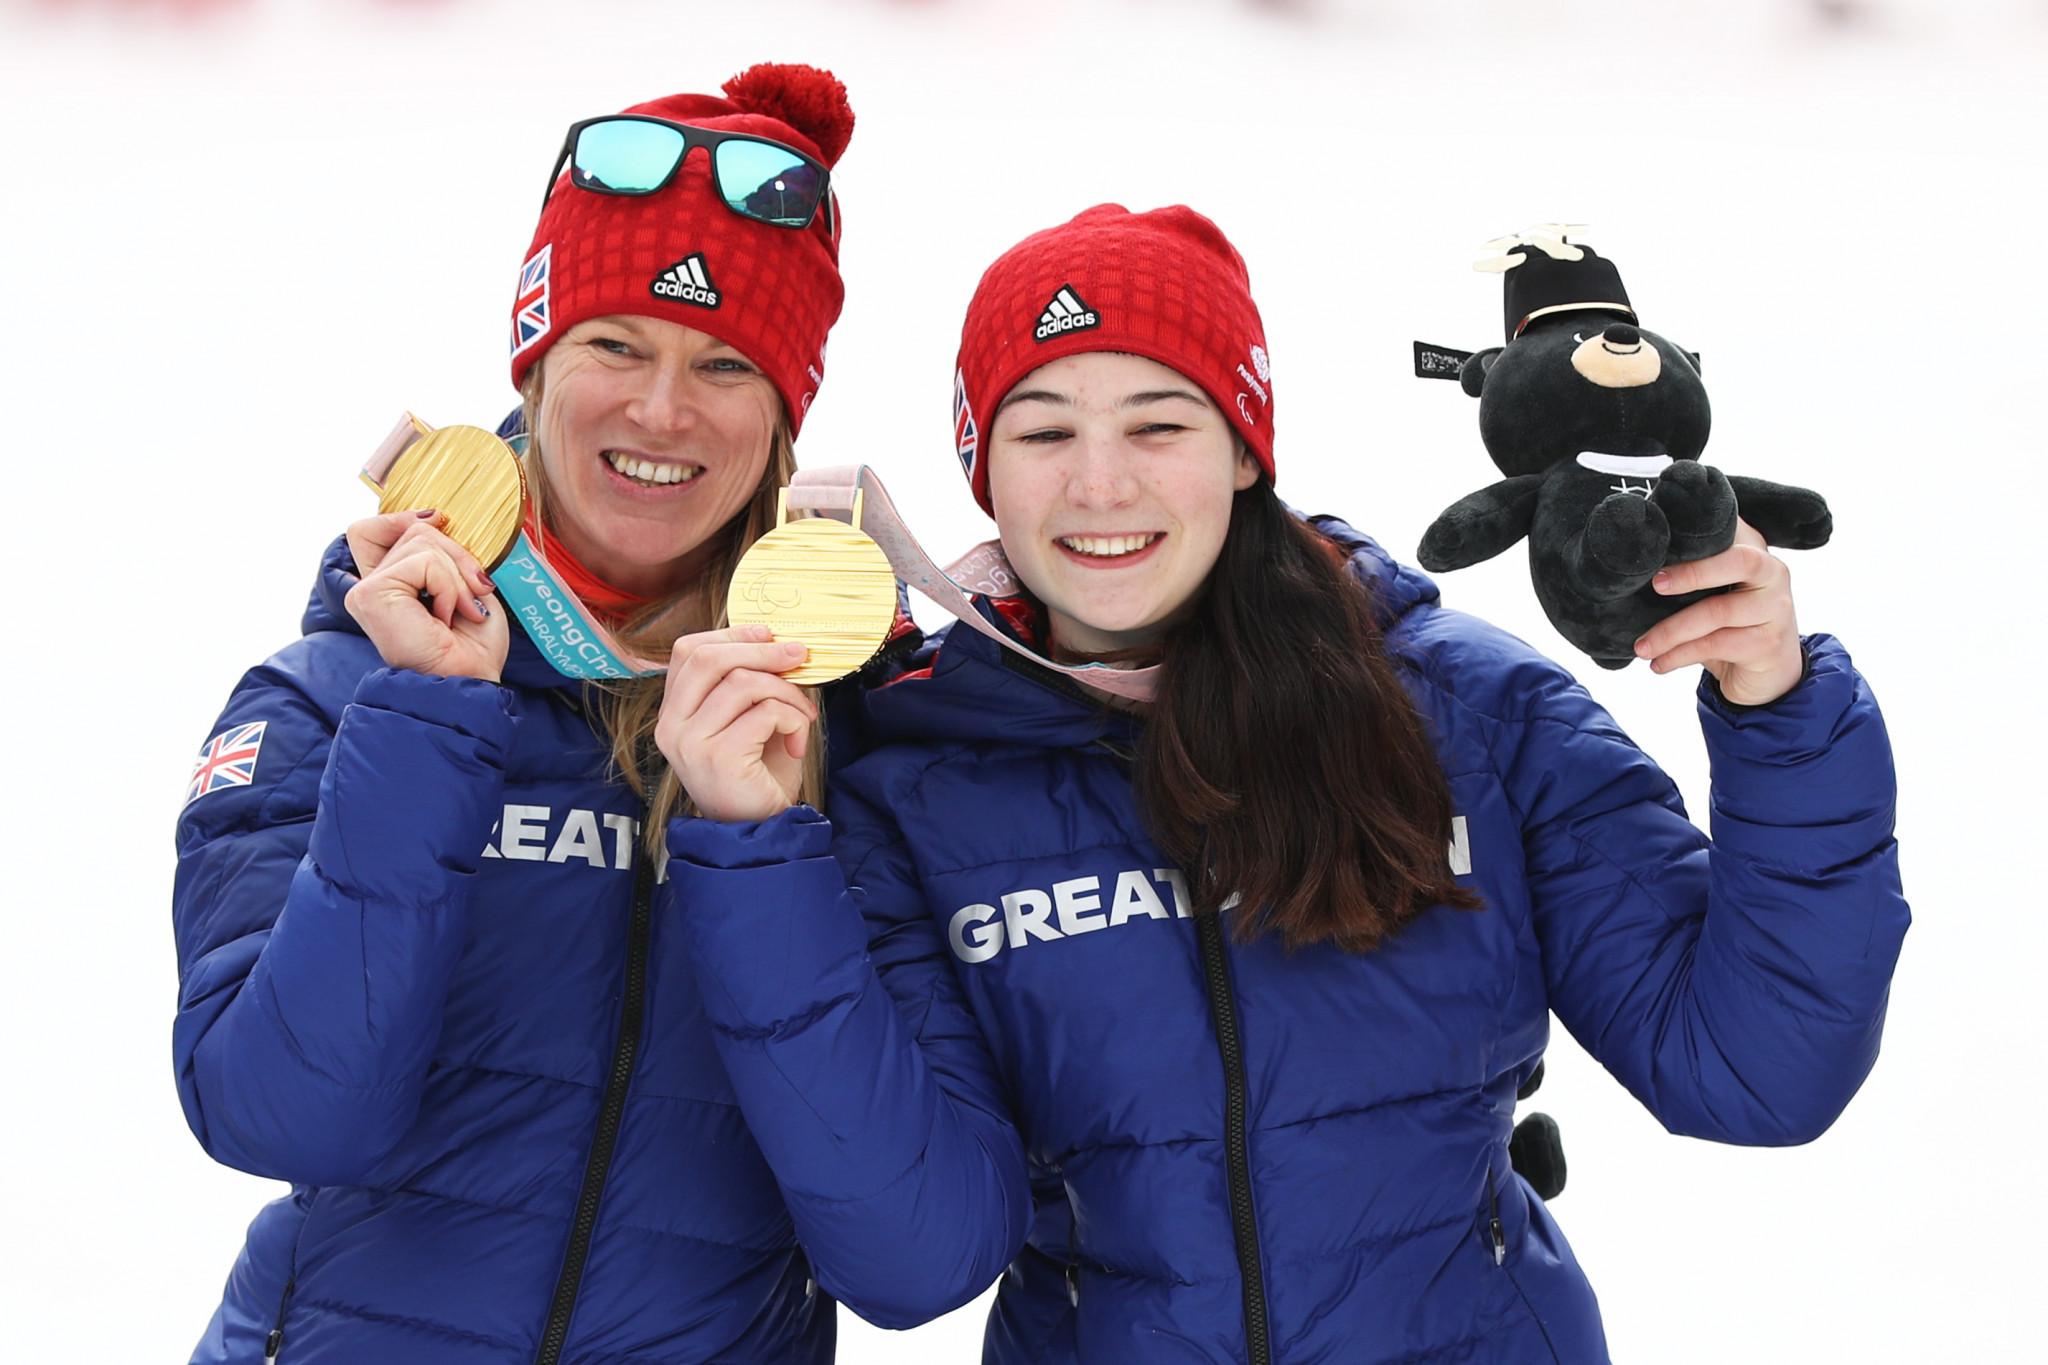 Fitzpatrick shocks Farkašová to take Paralympic women's visually impaired slalom gold at Pyeongchang 2018